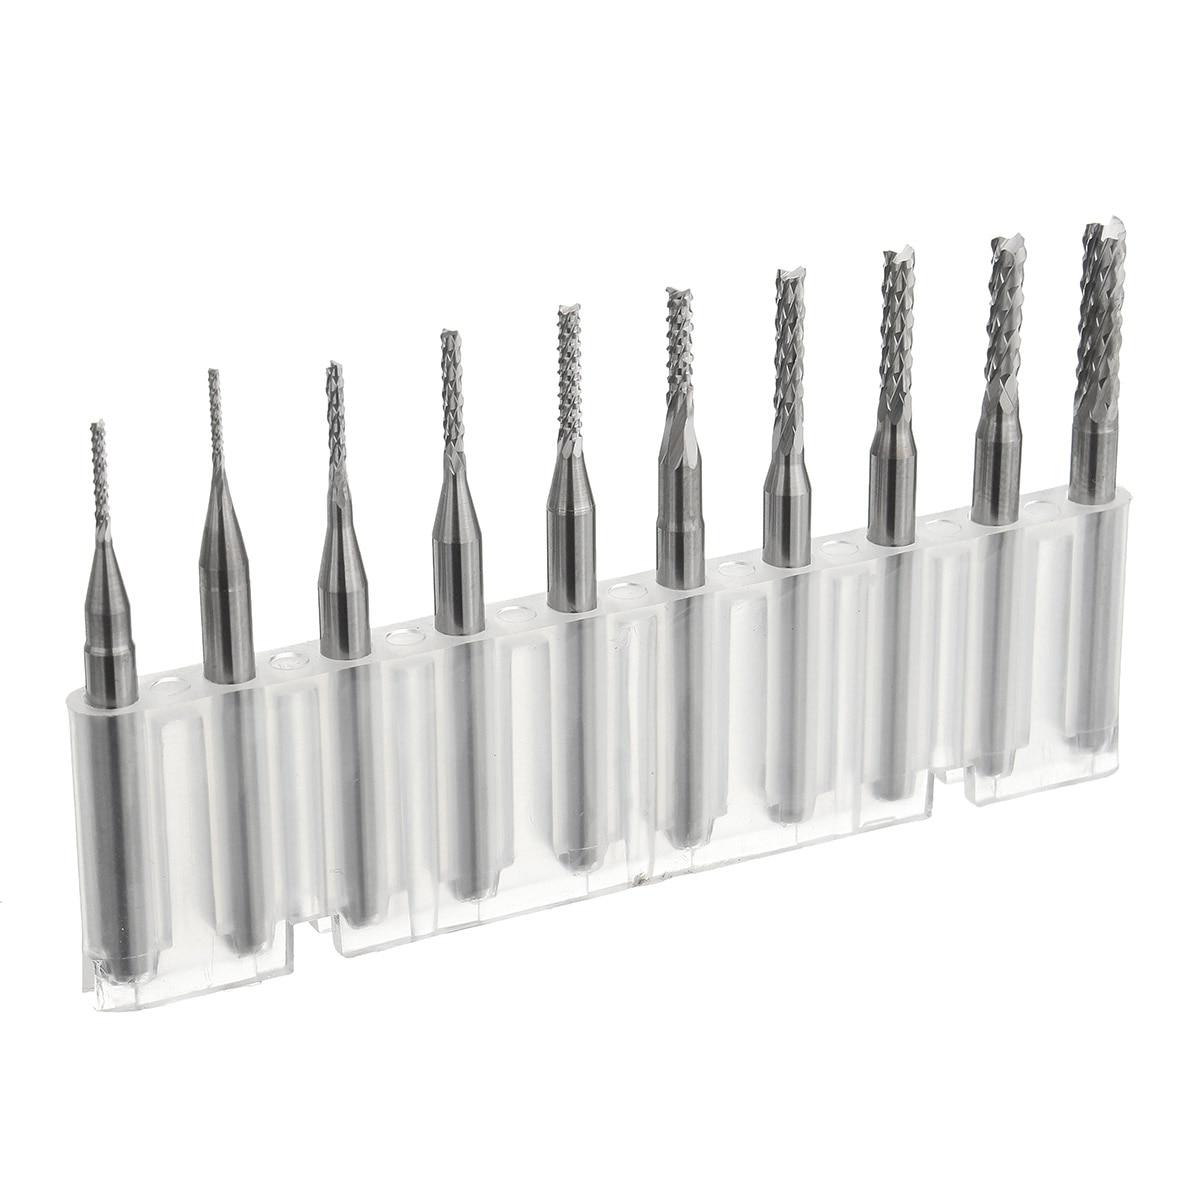 10Pcs/Box 1/8 Inch 0.8/1.0/1.2/1.4/1.6/1.8/2.0/2.2/2.4/3.17mm PCB Engraving Cutter Rotary CNC End Mill Milling Cuter Drill Bits 10pcs 1 8 0 8 3 175mm pcb twist drill bit set engraving cutter rotary cnc end mill for metal drill bit yx